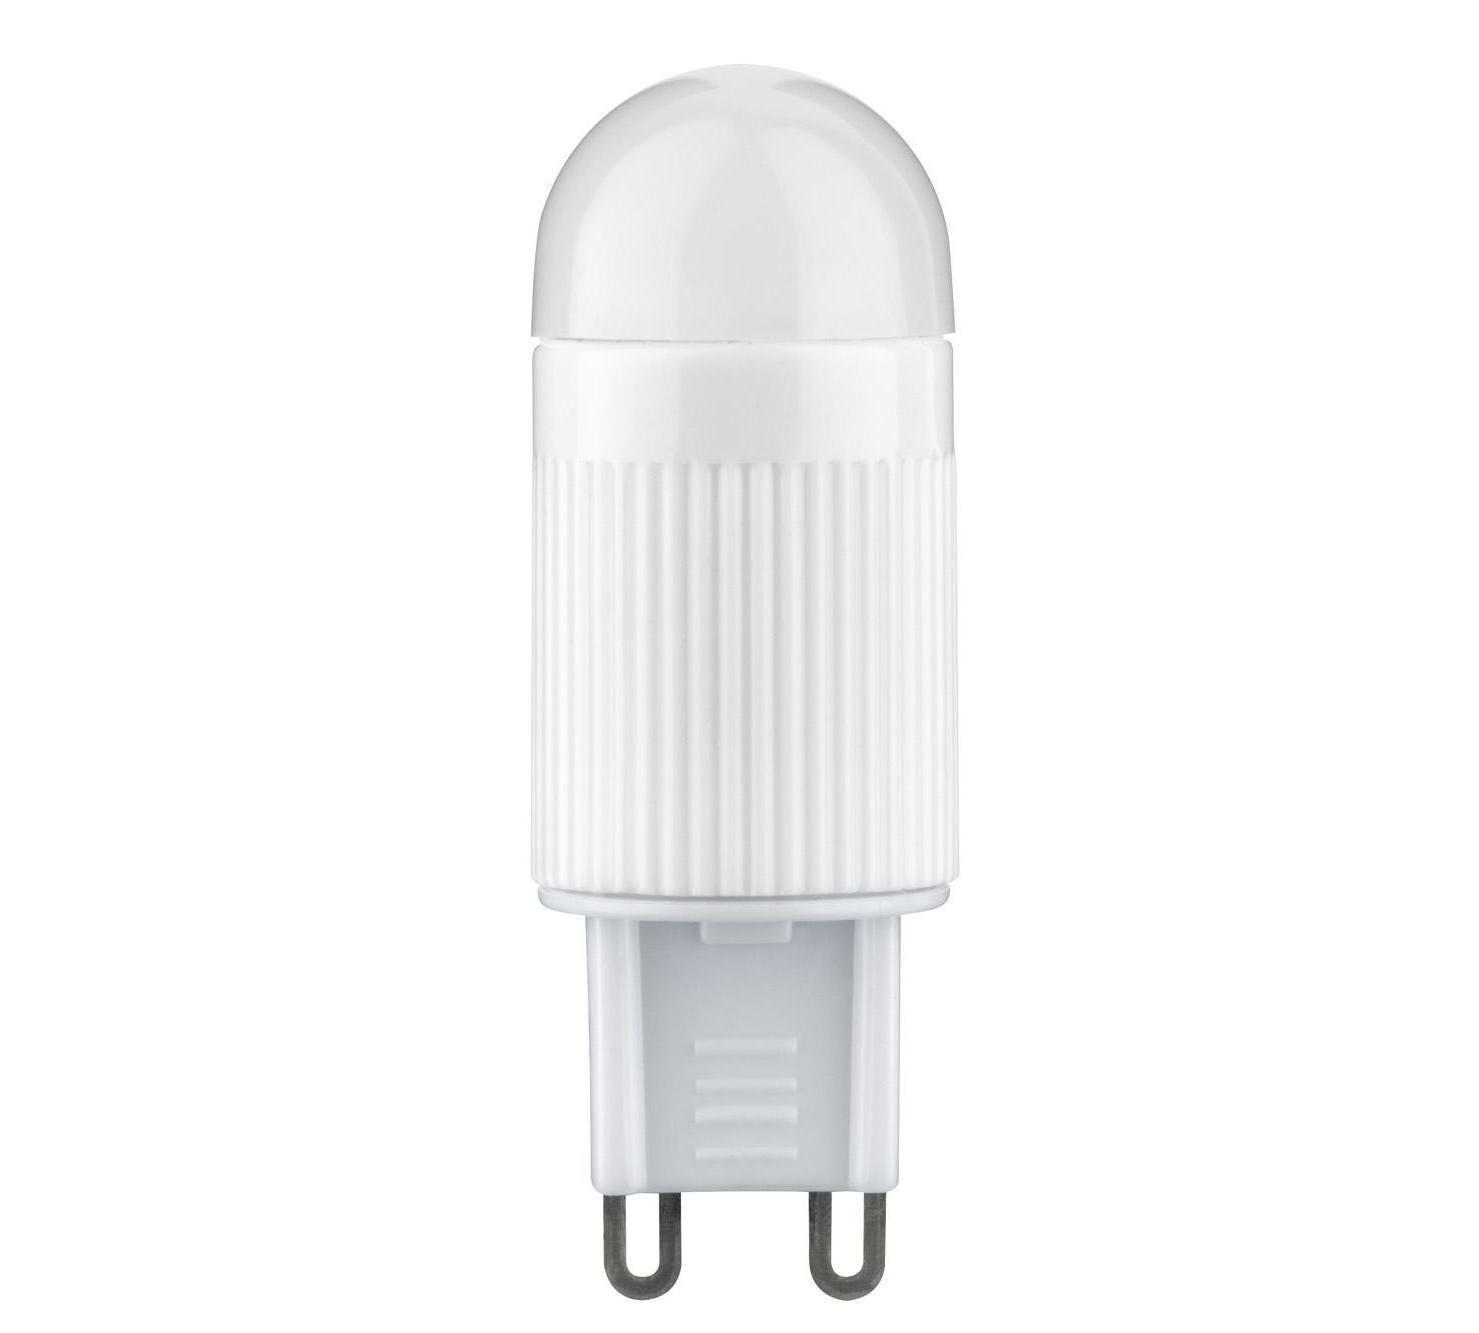 PAULMANN P 28290 LED žárovka G9 2x2,4W 80-89 Ra opál